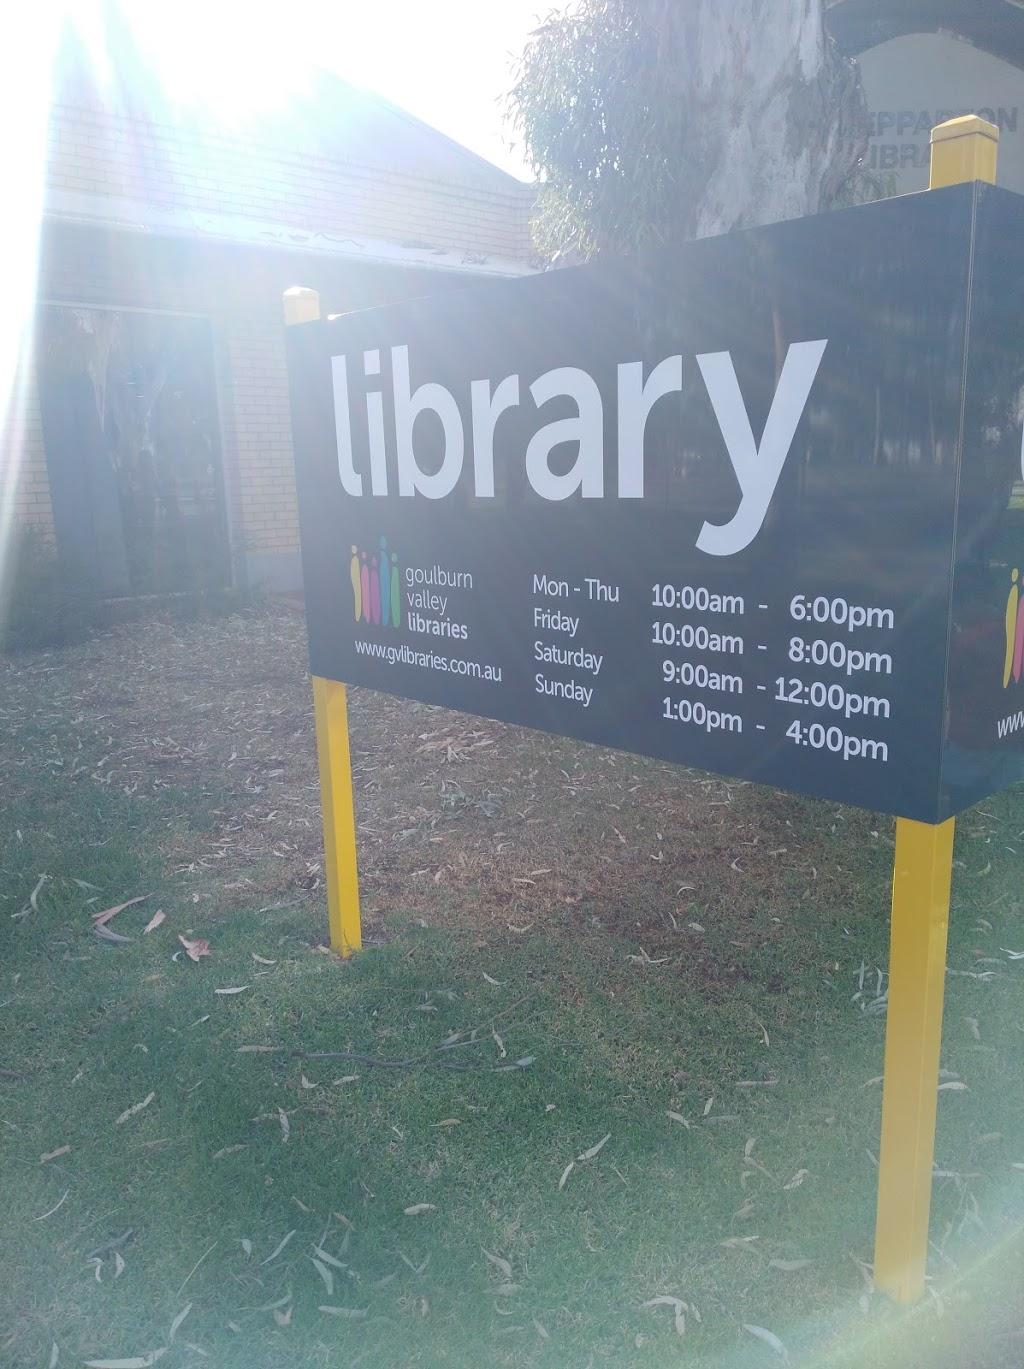 Shepparton Library | library | 41-42 Marungi St, Shepparton VIC 3630, Australia | 1300374765 OR +61 1300 374 765